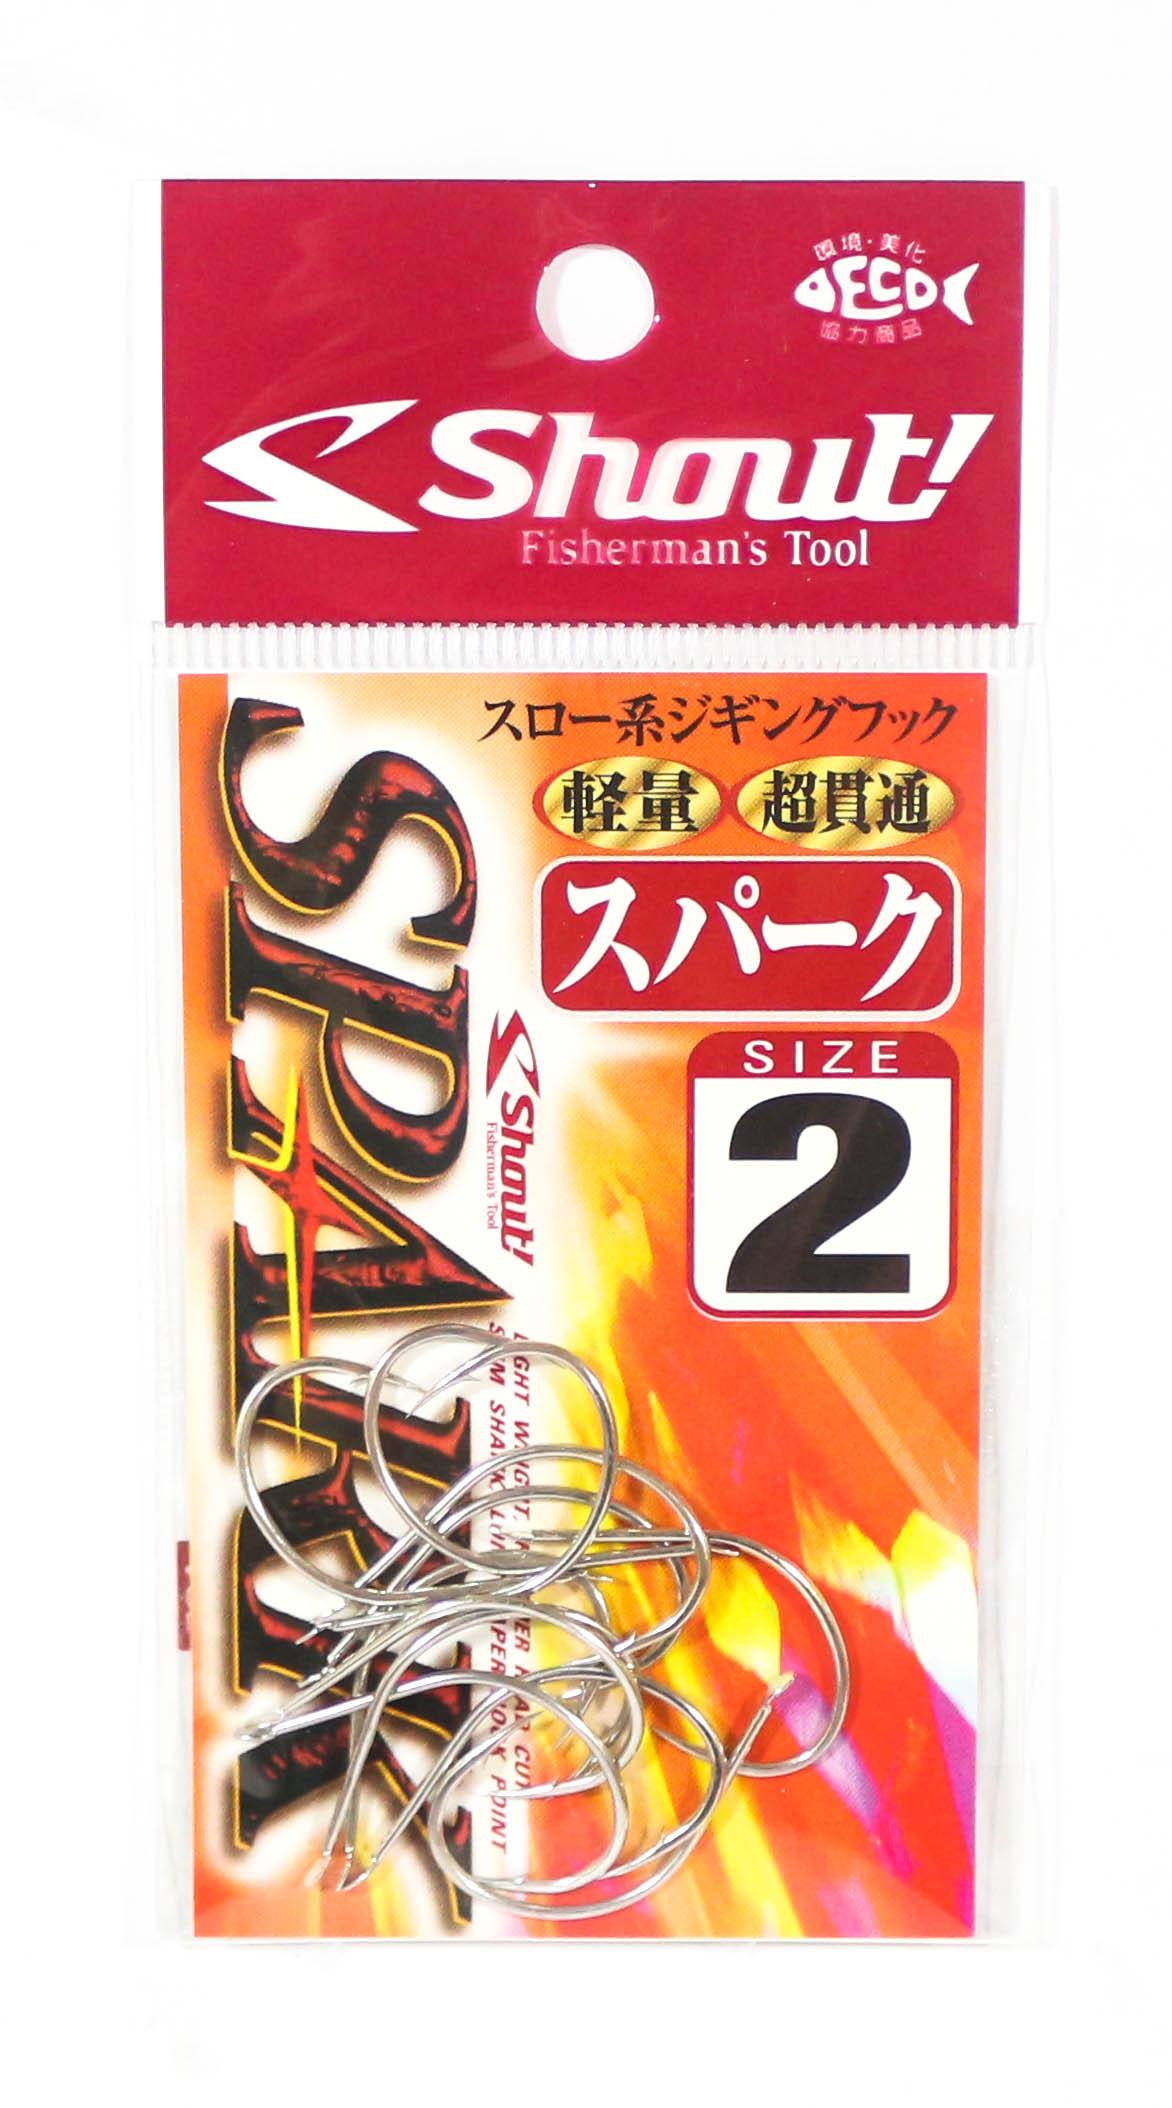 Shout 201-SP Spark Jigging Single Hook Silver Size 2 (5473)